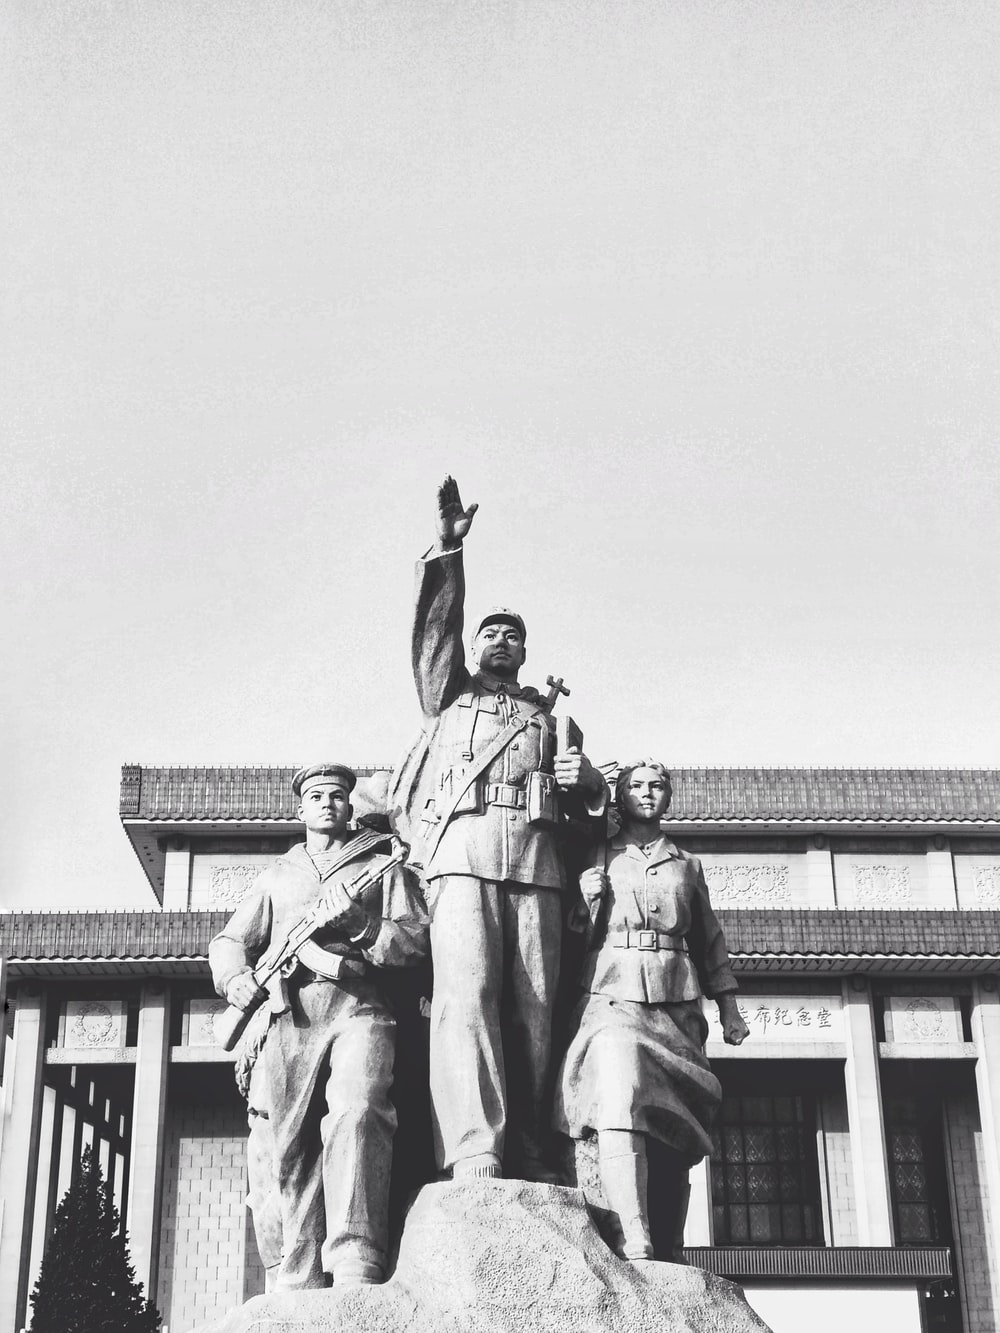 three people standing statue